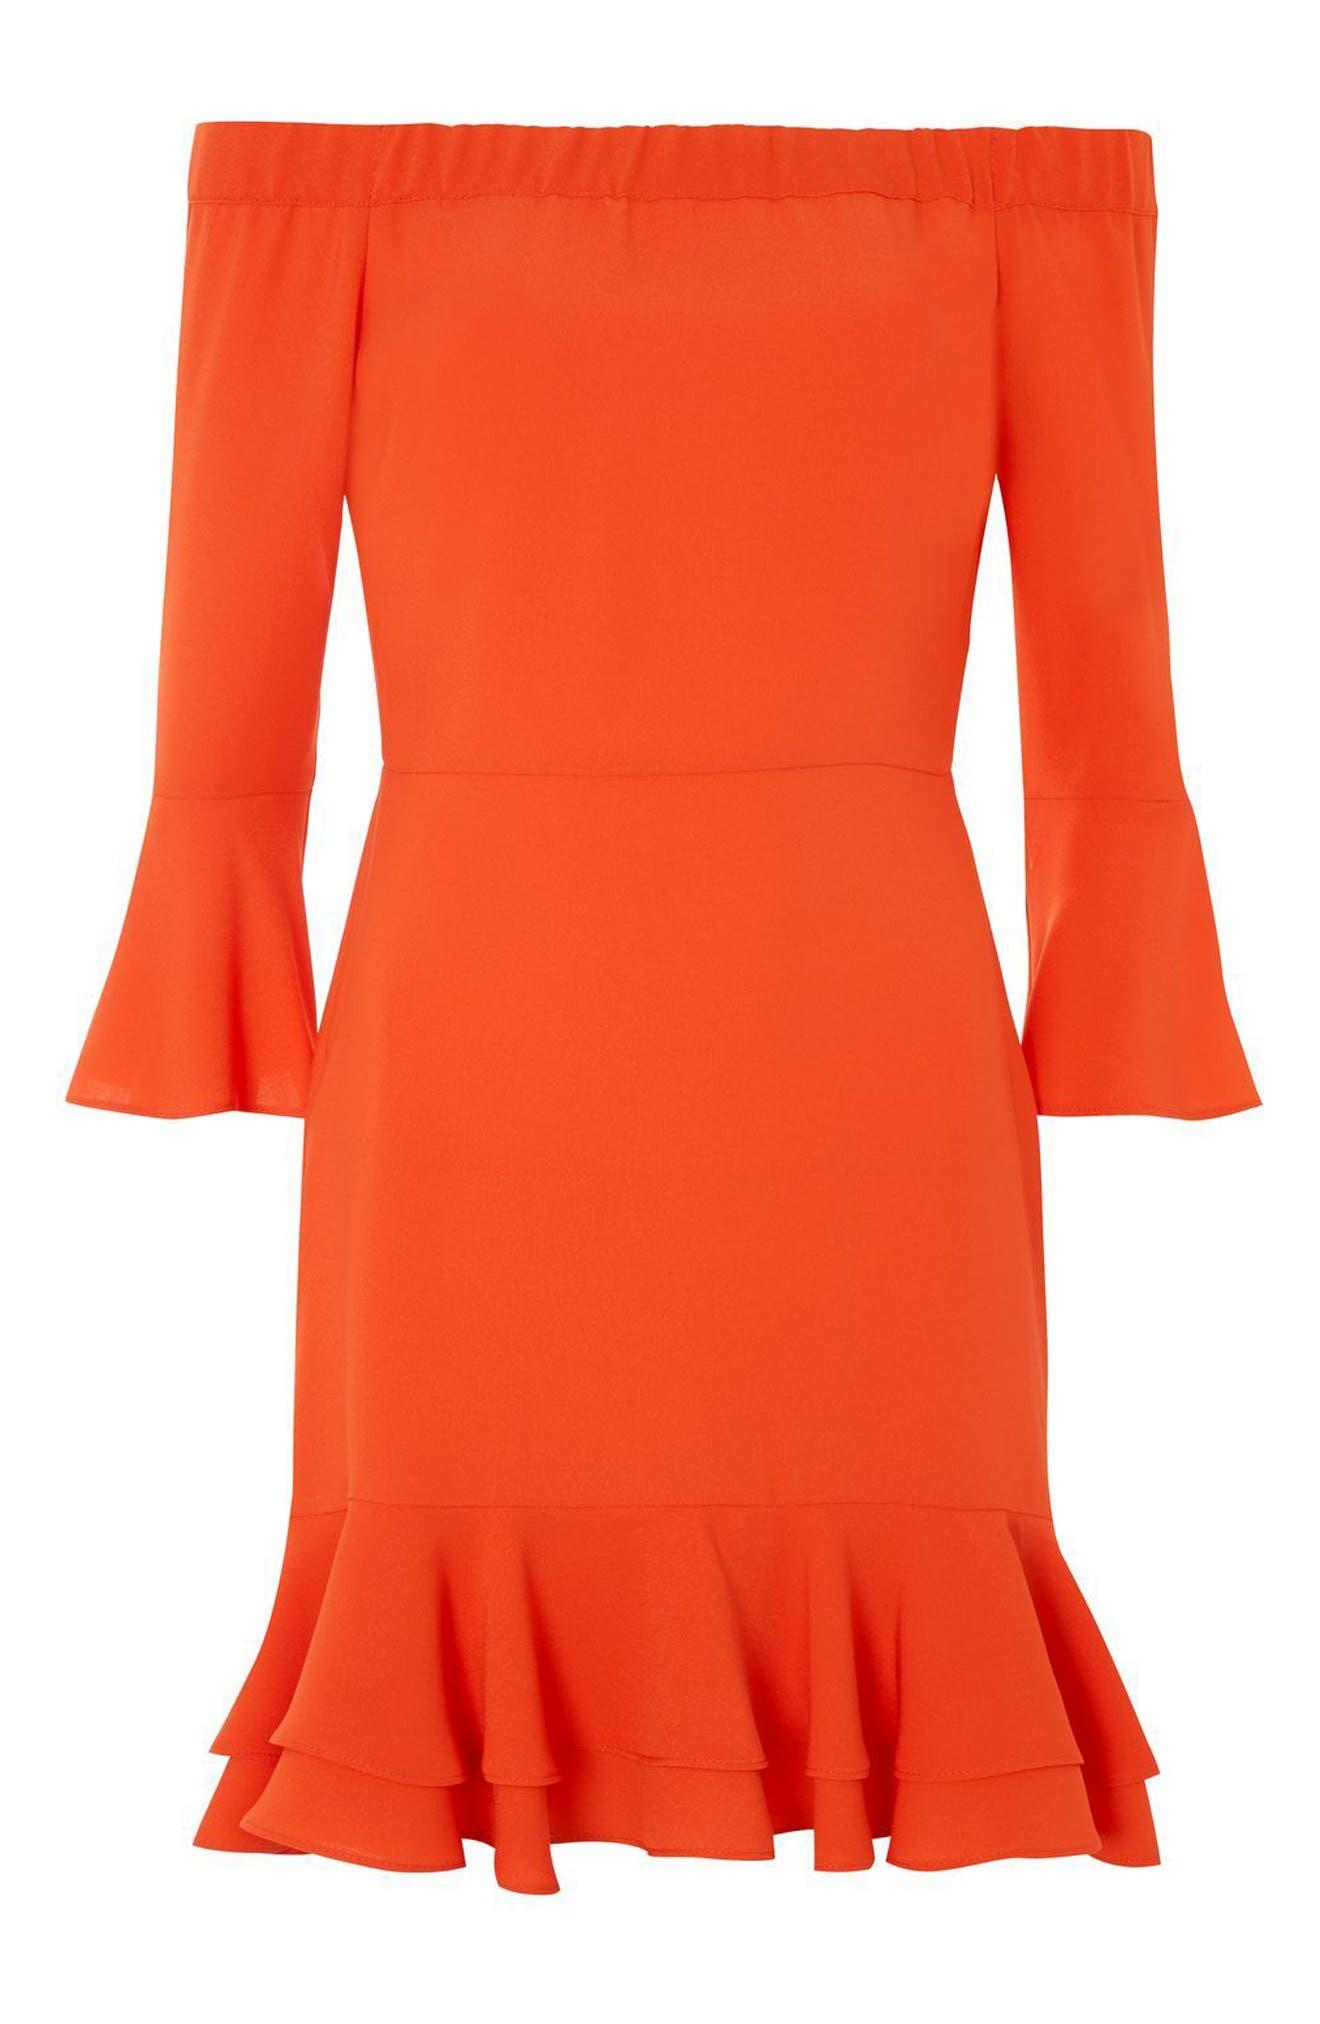 Topshop Off the Shoulder Ruffle Dress